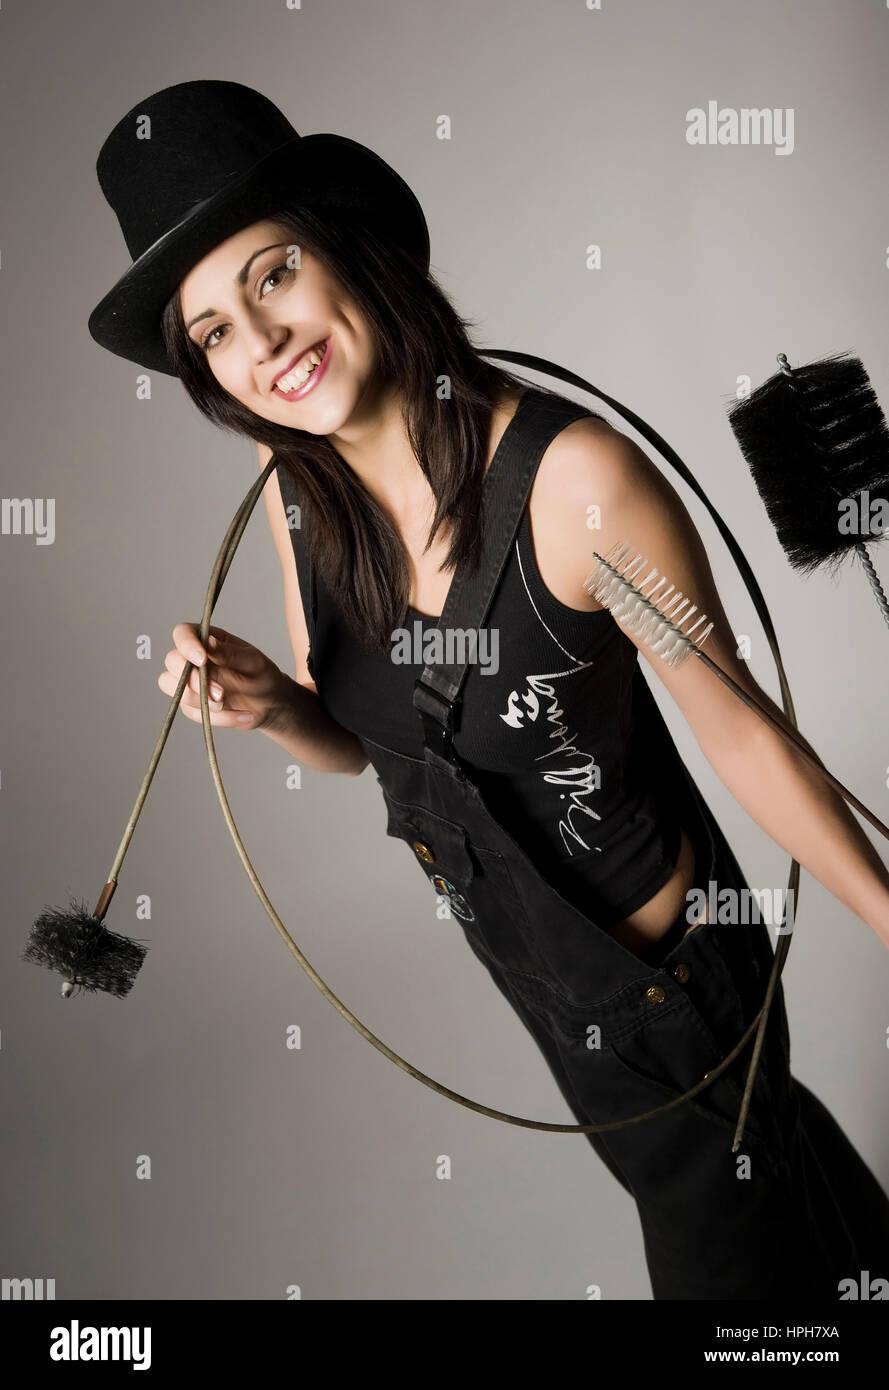 Rauchfangkehrerin, Gluecksbringer - female chimney sweep, Model released - Stock Image